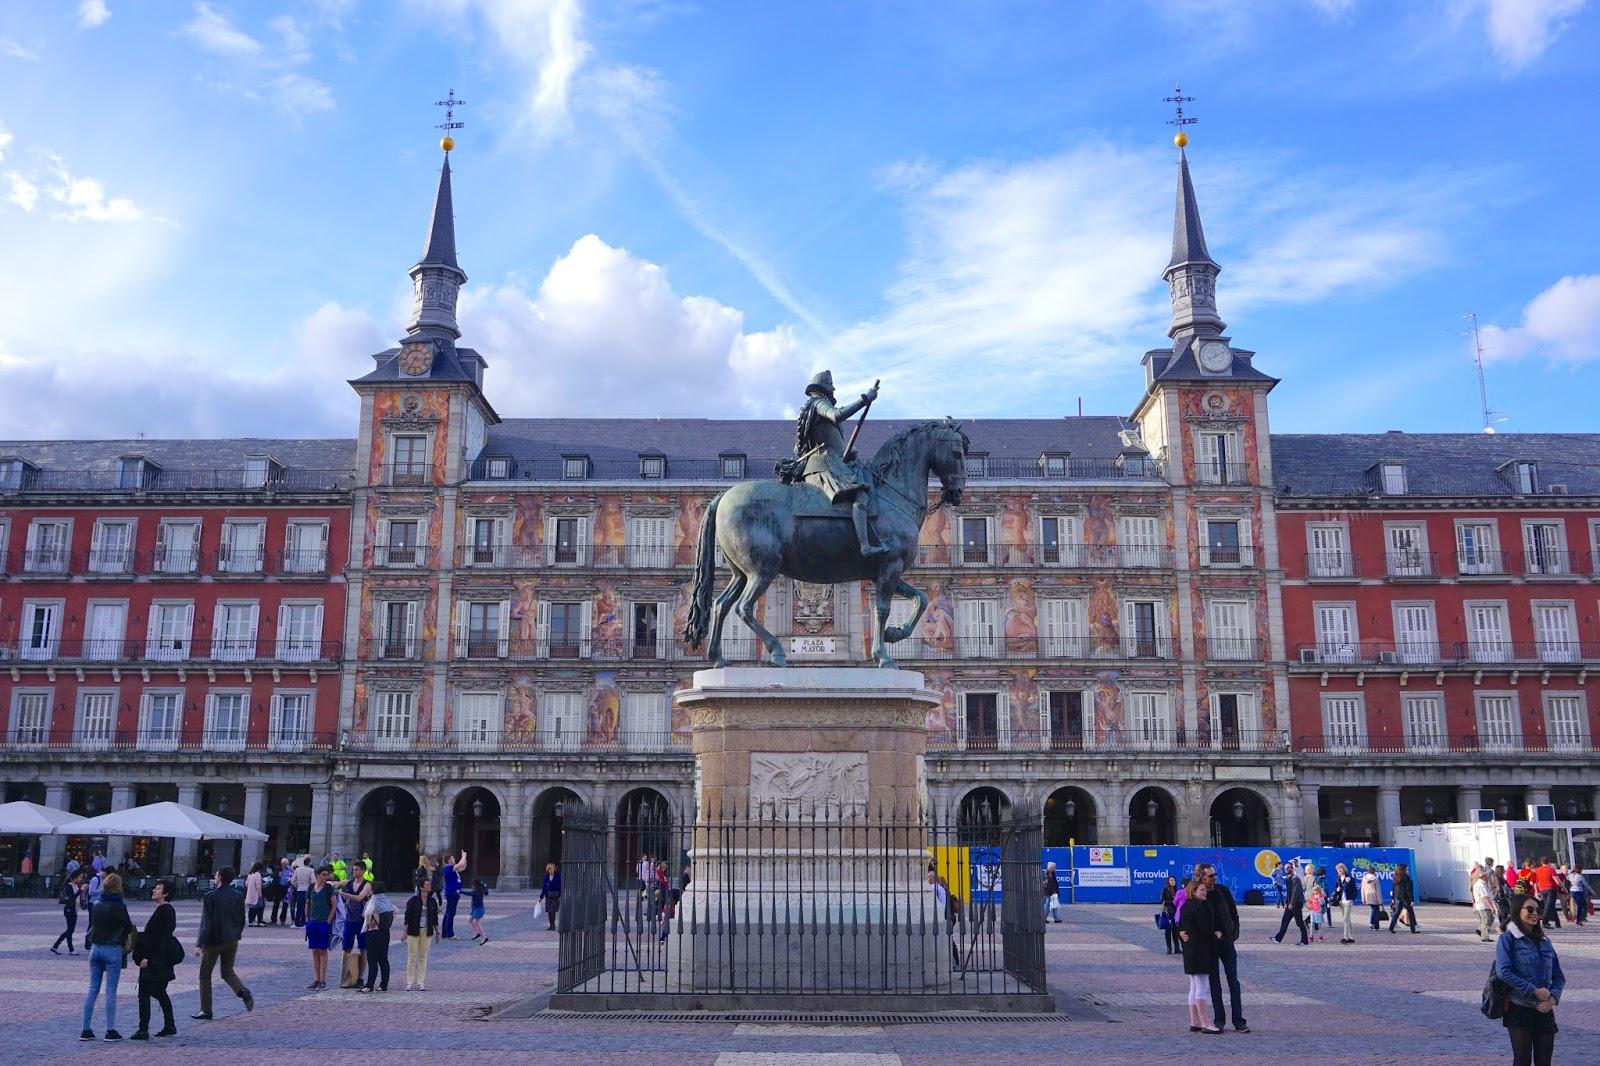 Blue skies over Plaza Mayor in Madrid